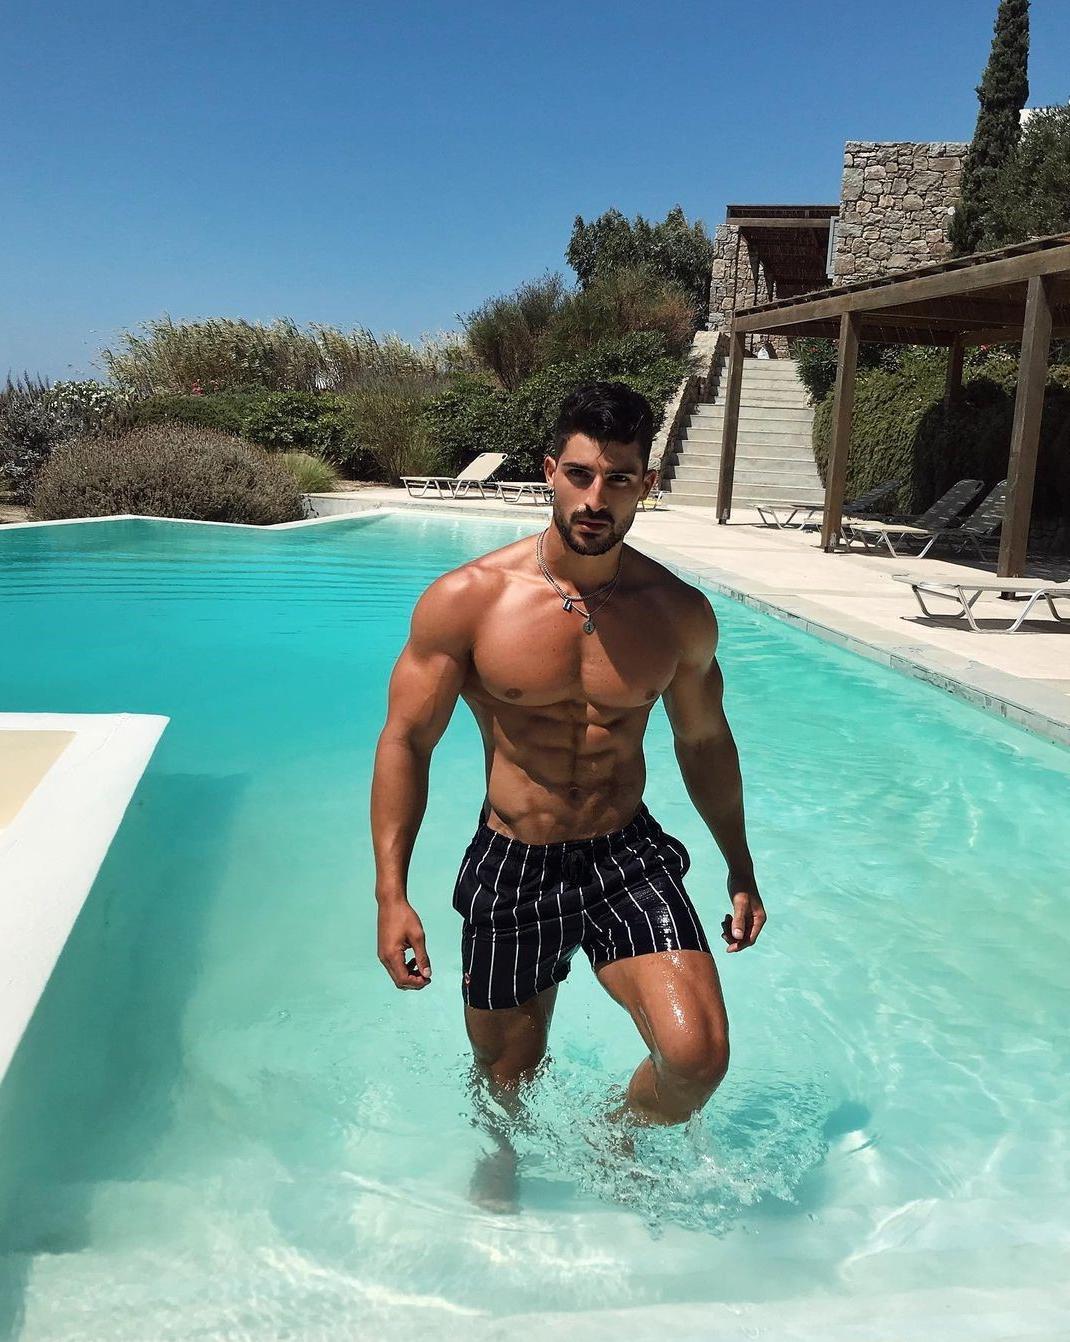 handsome-pool-men-nicholas-gala-shirtless-ripped-muscle-body